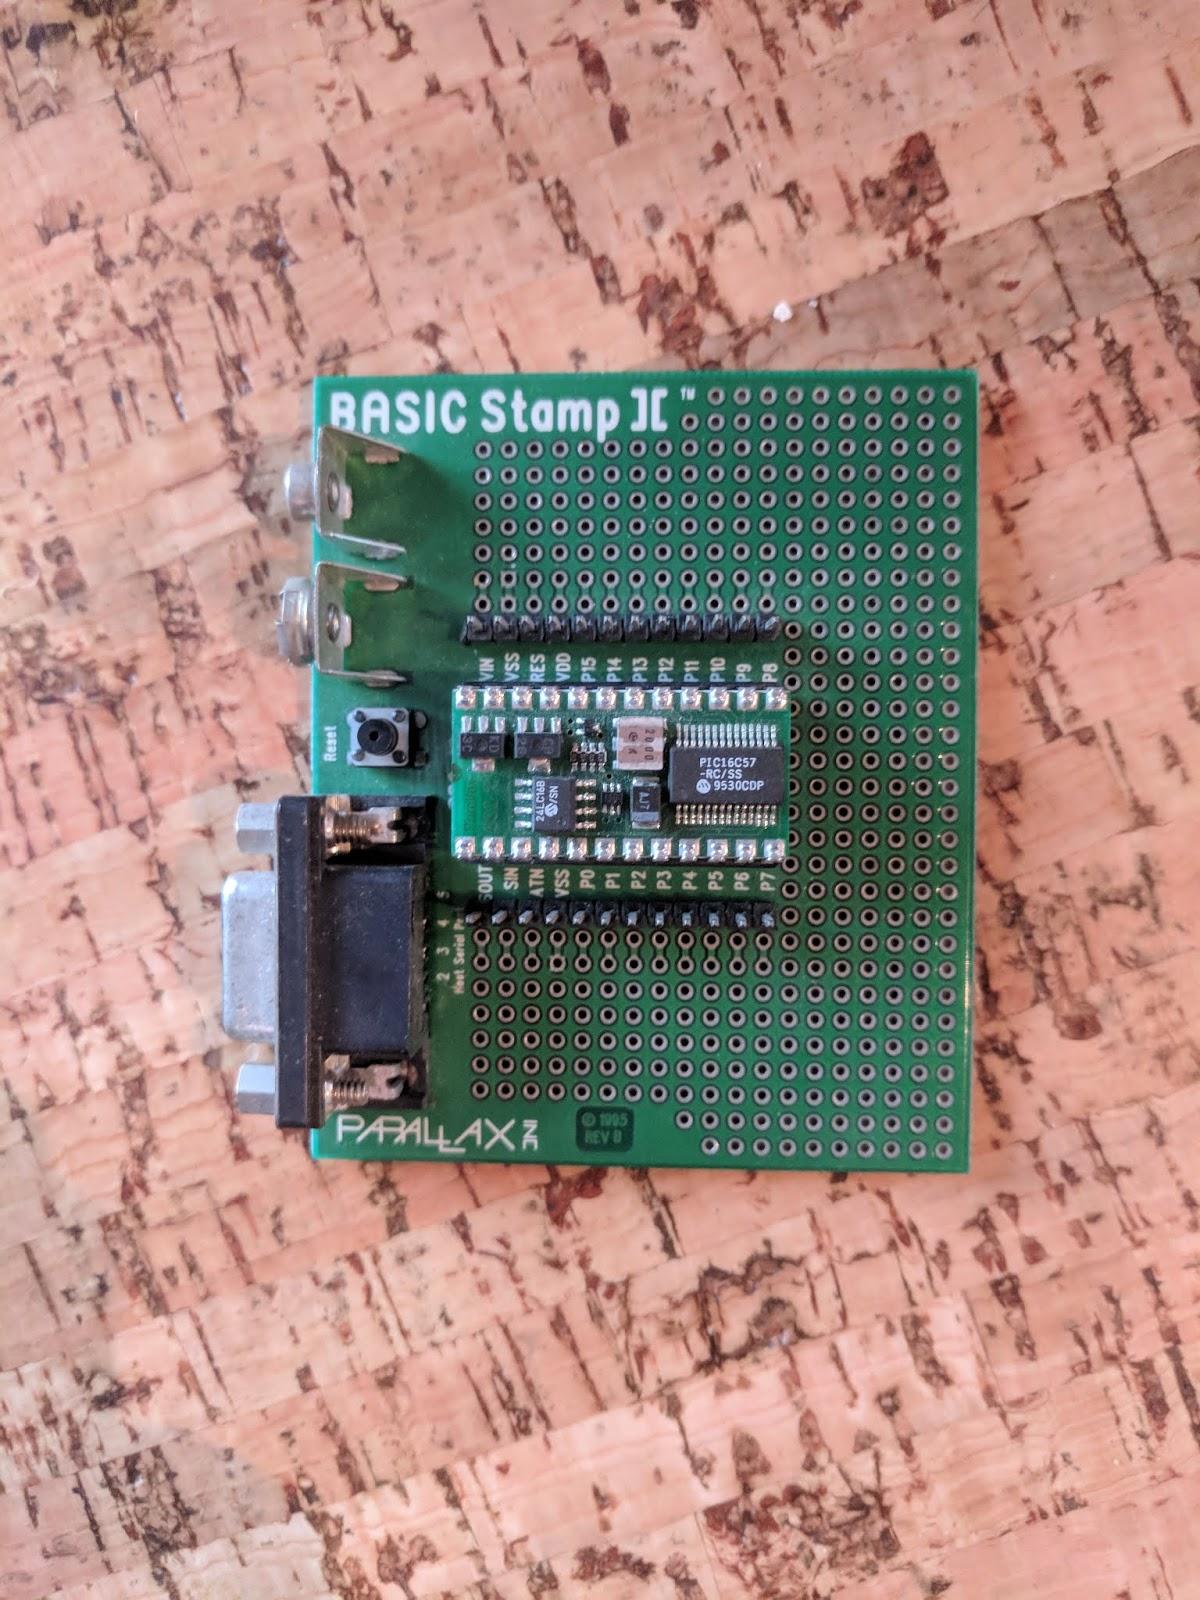 Coding Relic: The Arduino before the Arduino: Parallax Basic